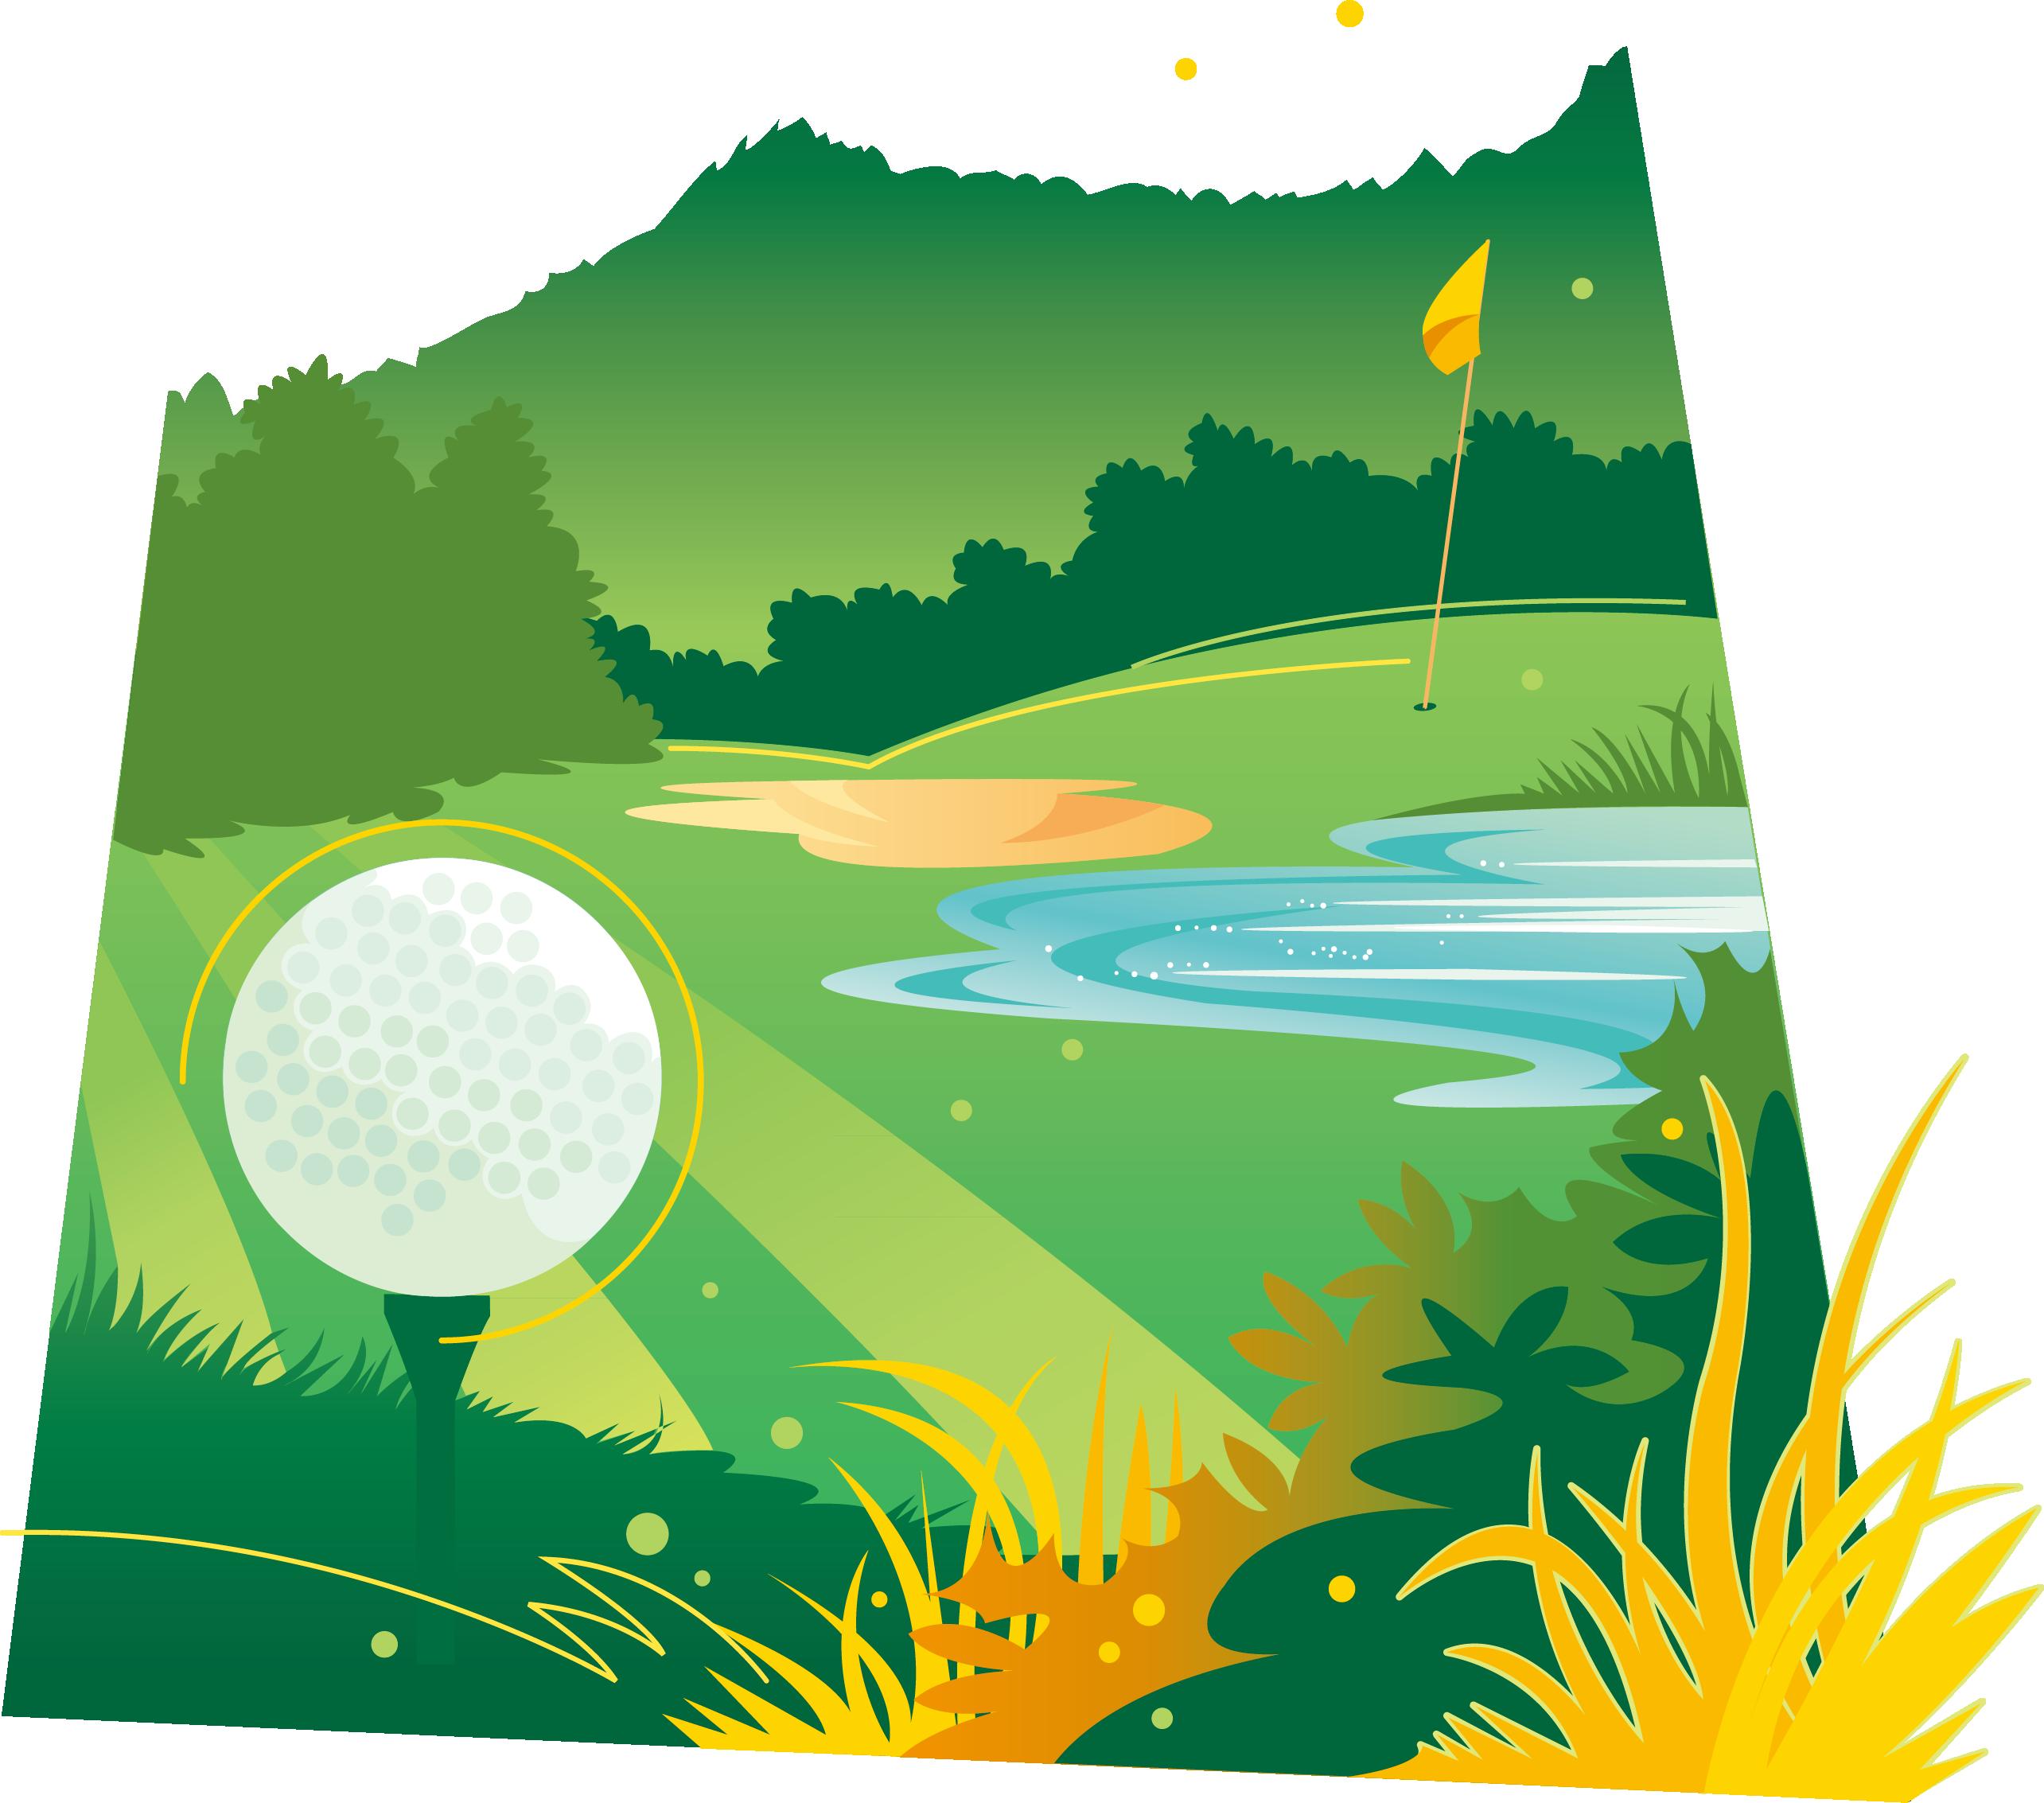 Green graphic design icon. Clipart grass golf ball